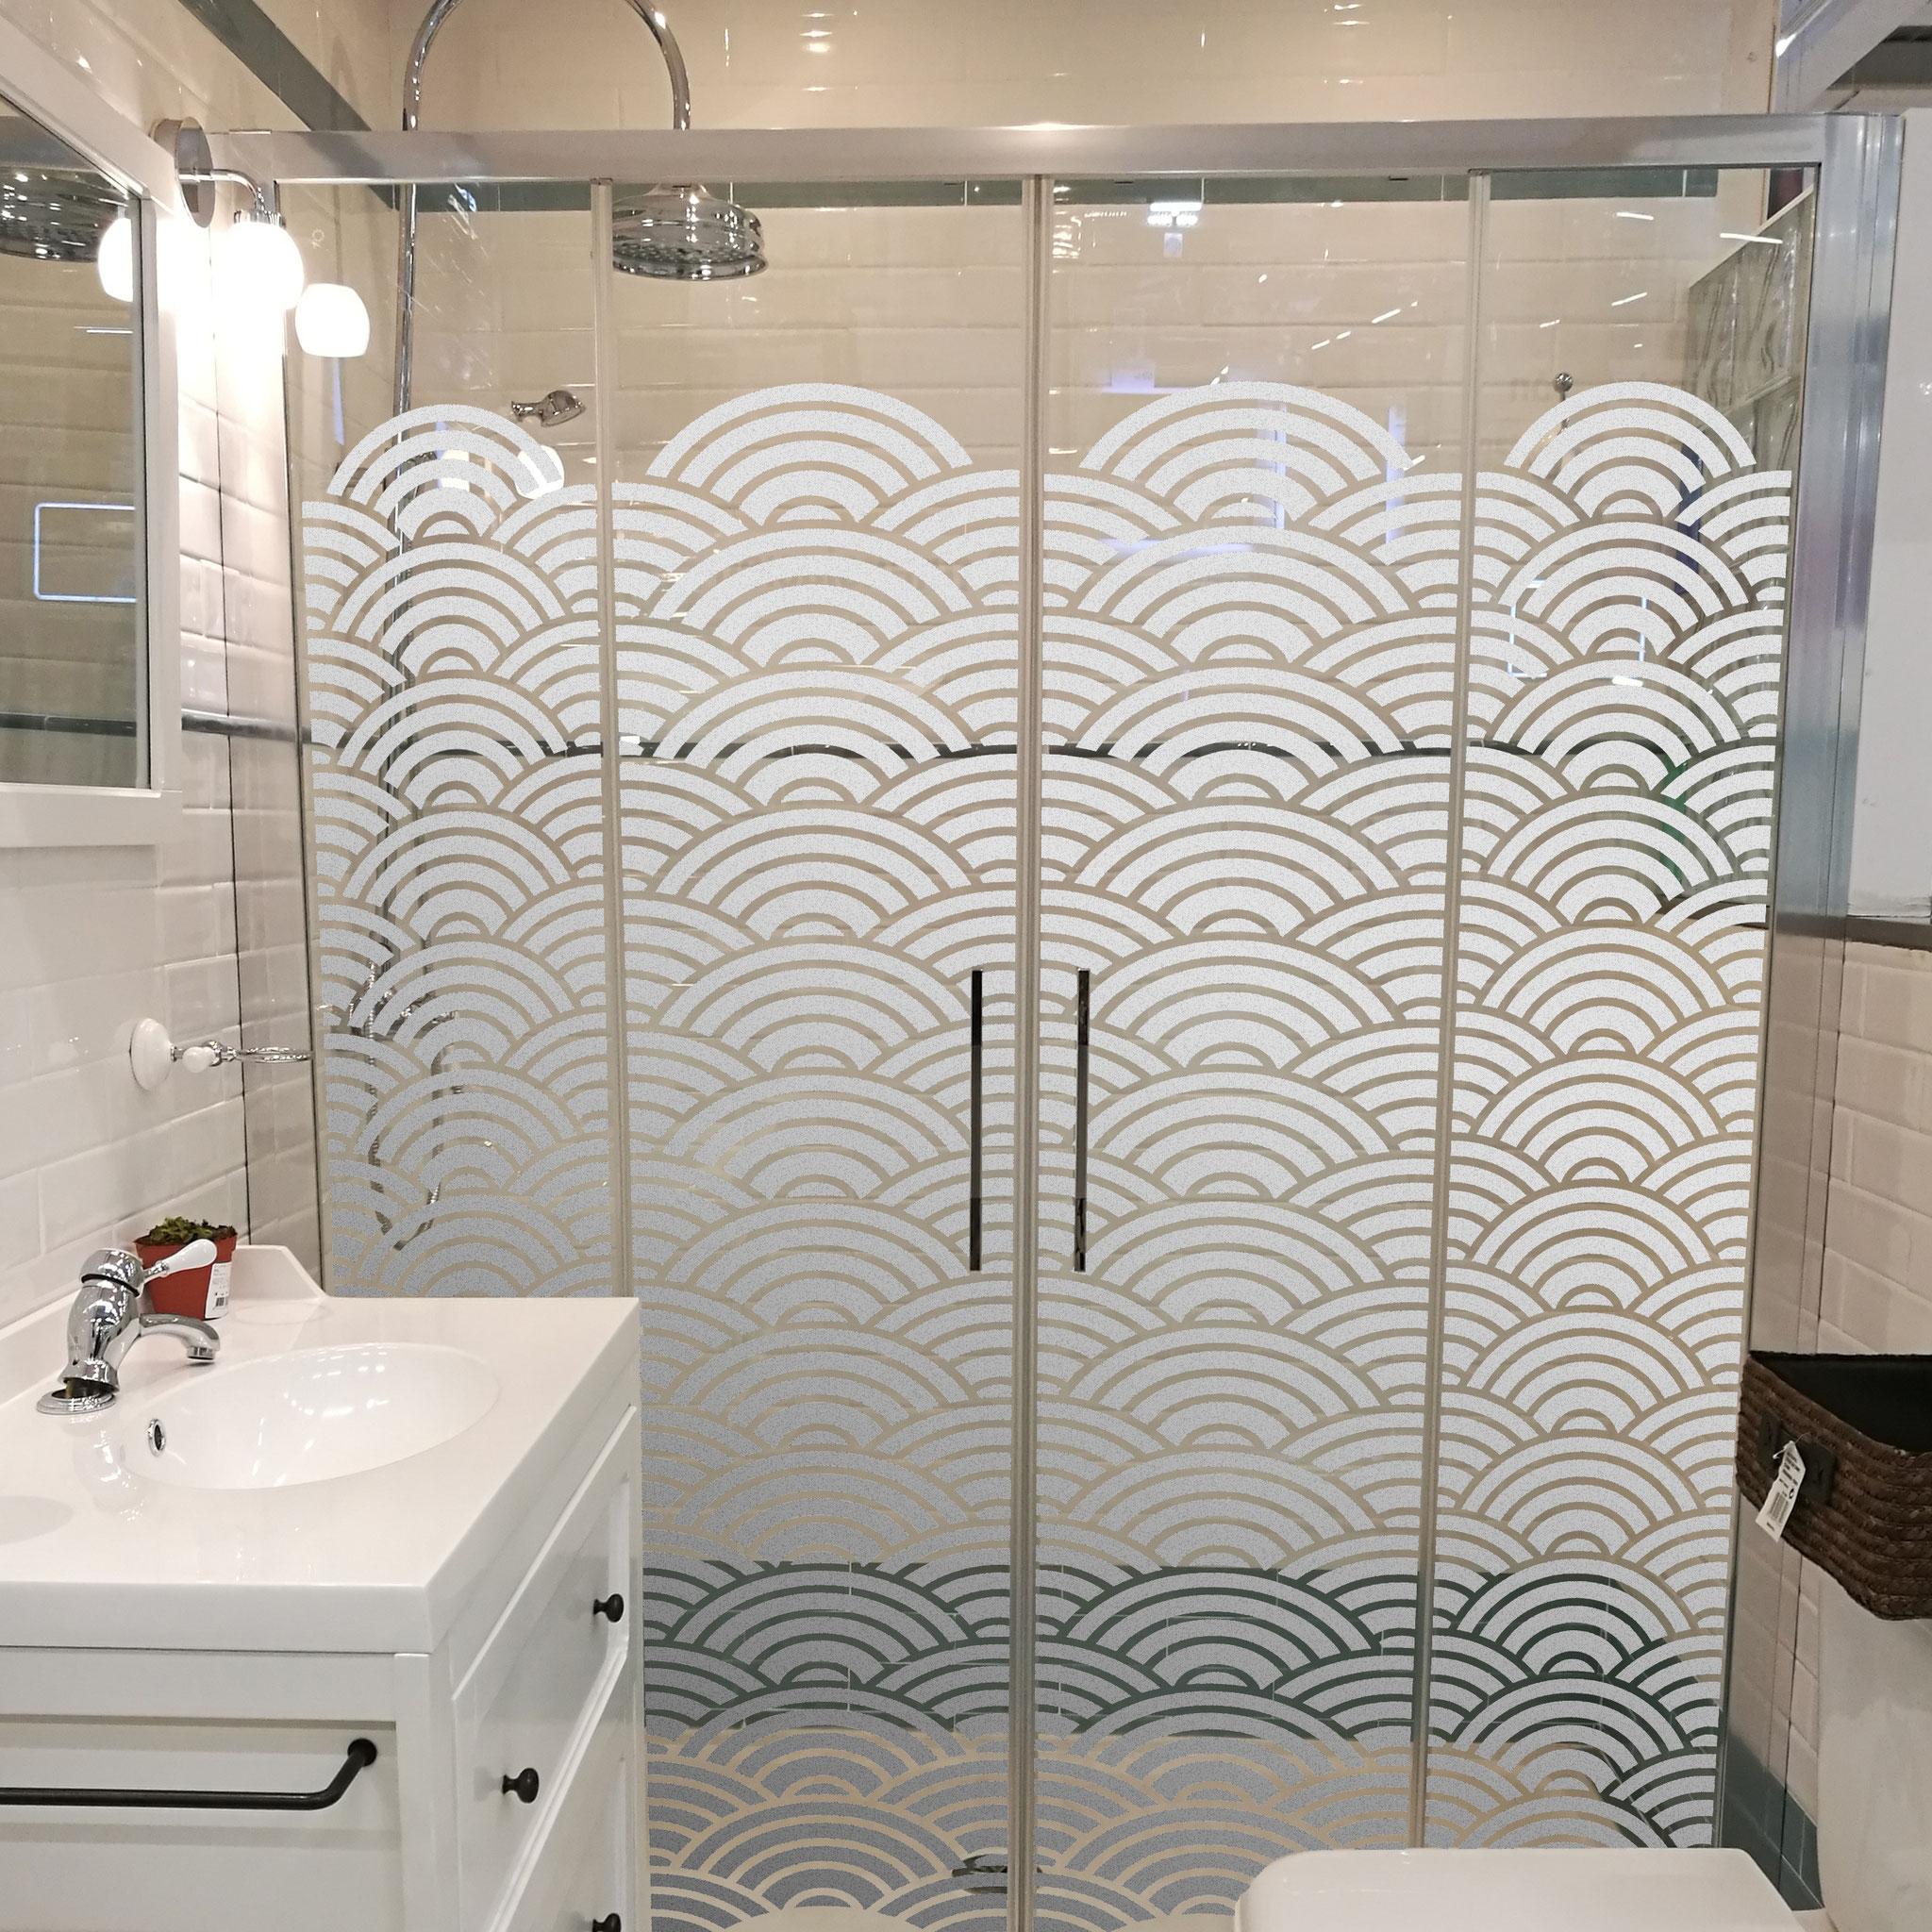 retovinilo, vinilos decorativos, vinilos, acido, glass, traslucido, mamparas, cristal, baño, intimidad